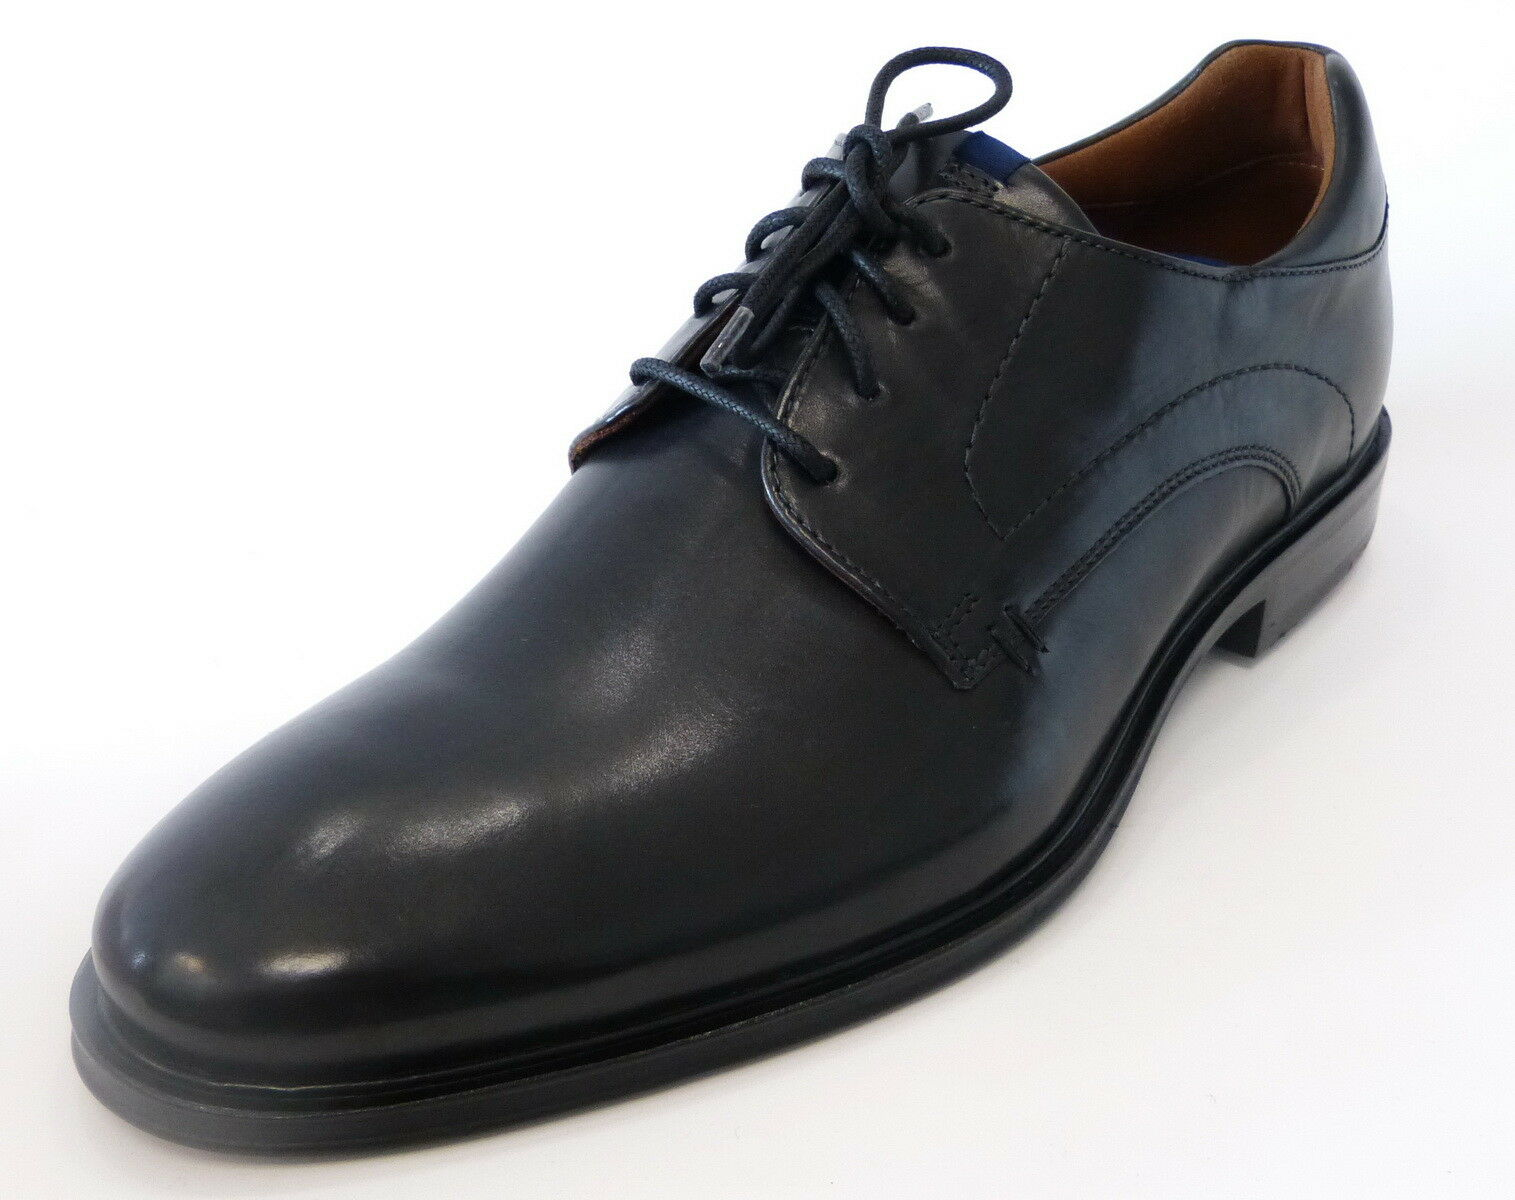 Lloyd Business Milan 16-213-00 schwarz Leder X Motion Memory Foam Schnür Schuh